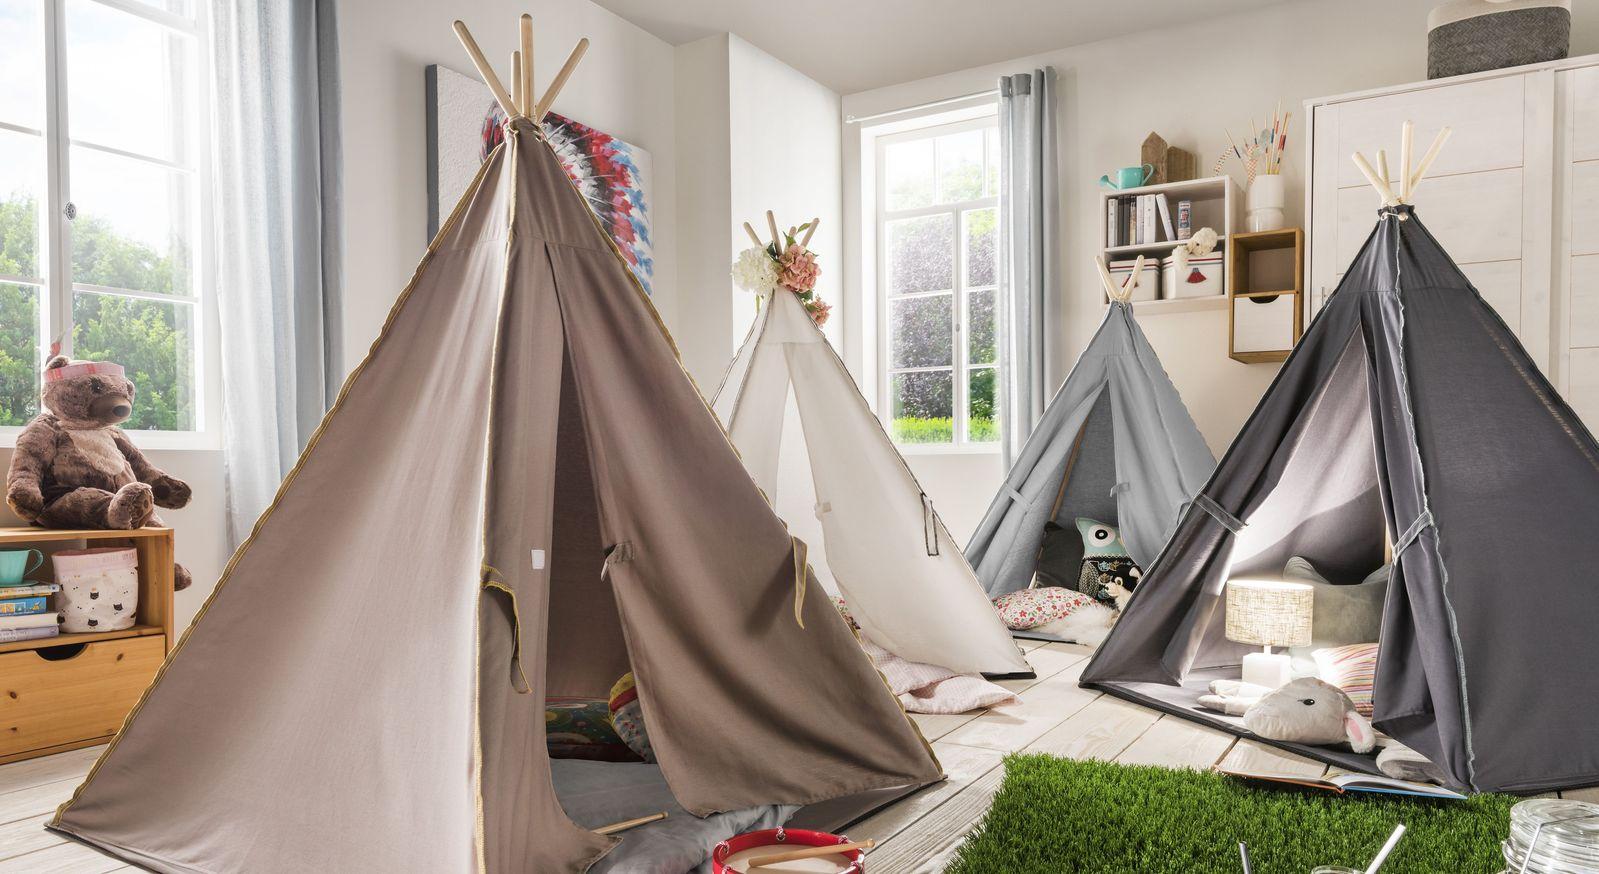 Spielzelt Kids Paradise mit Zeltkonstruktion aus massiver Fichte